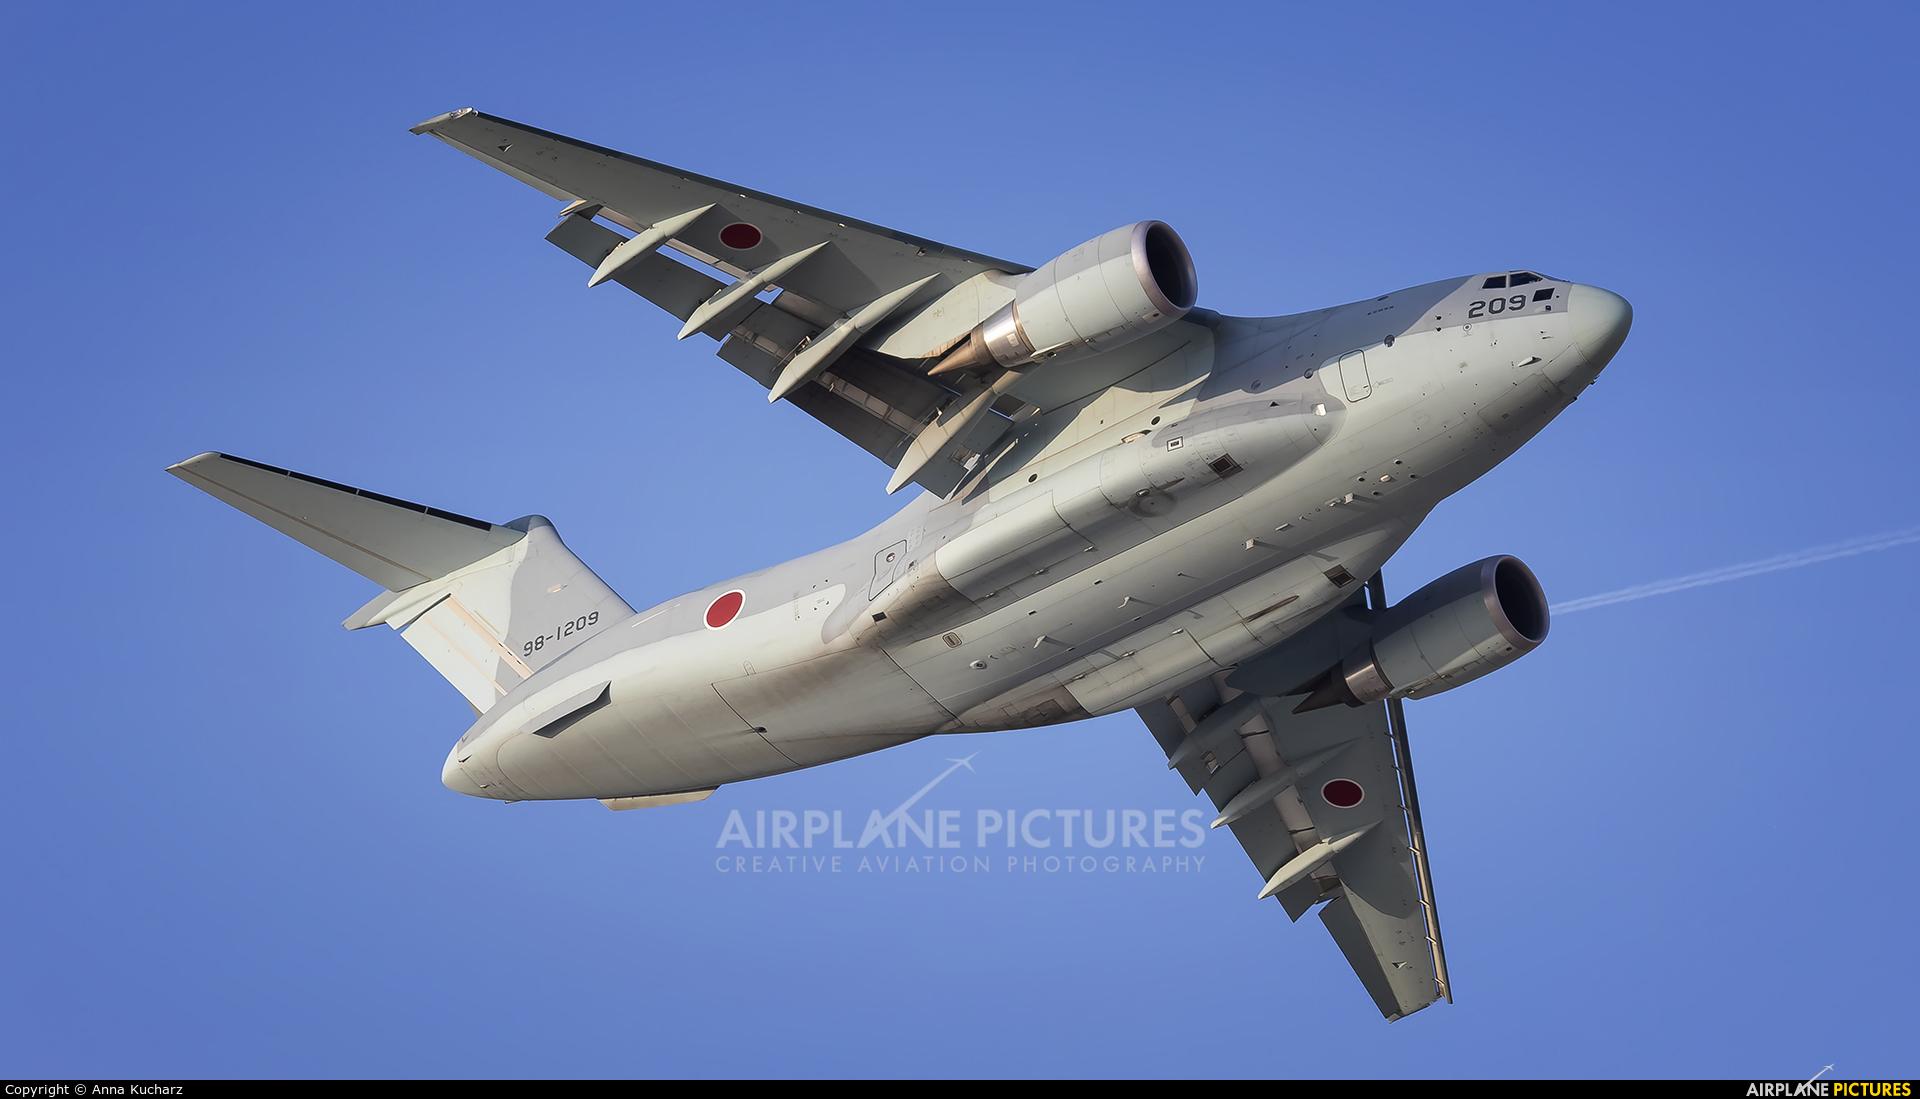 Japan - Air Self Defence Force 98-1209 aircraft at Jebel Ali Al Maktoum Intl